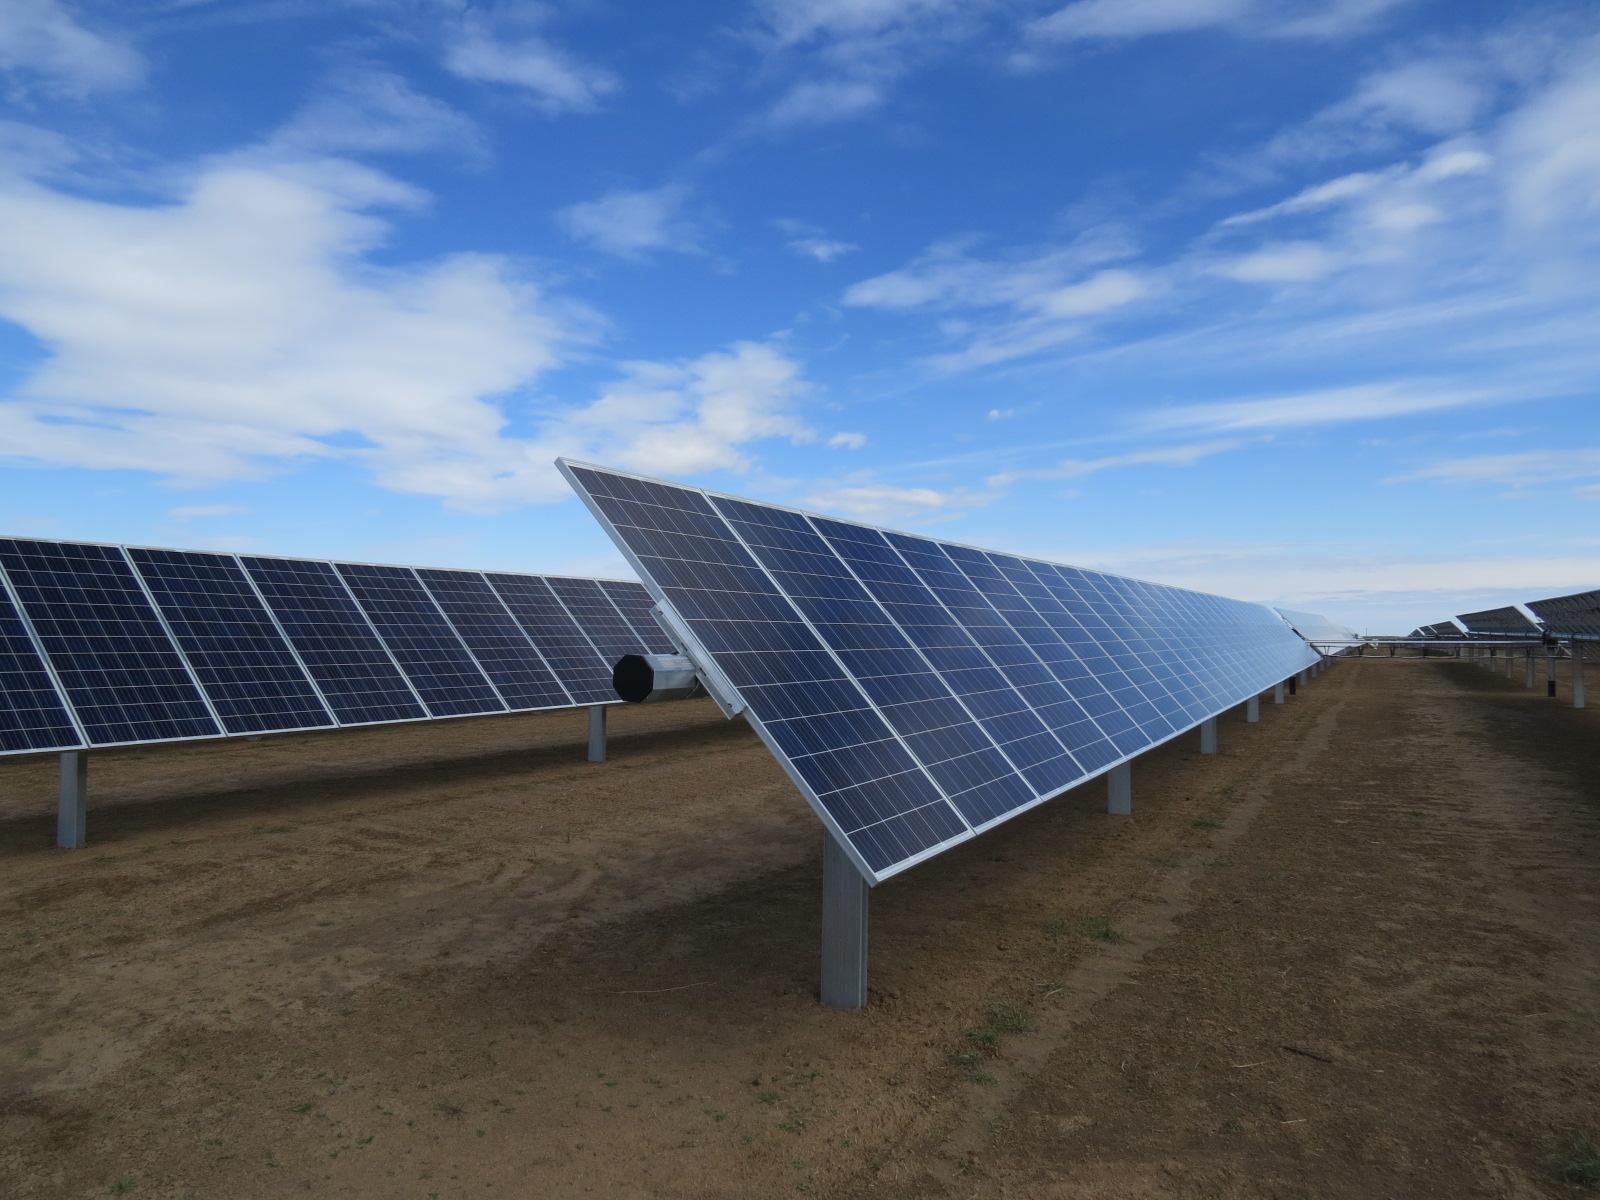 Victory Solar panels pic 15.JPG